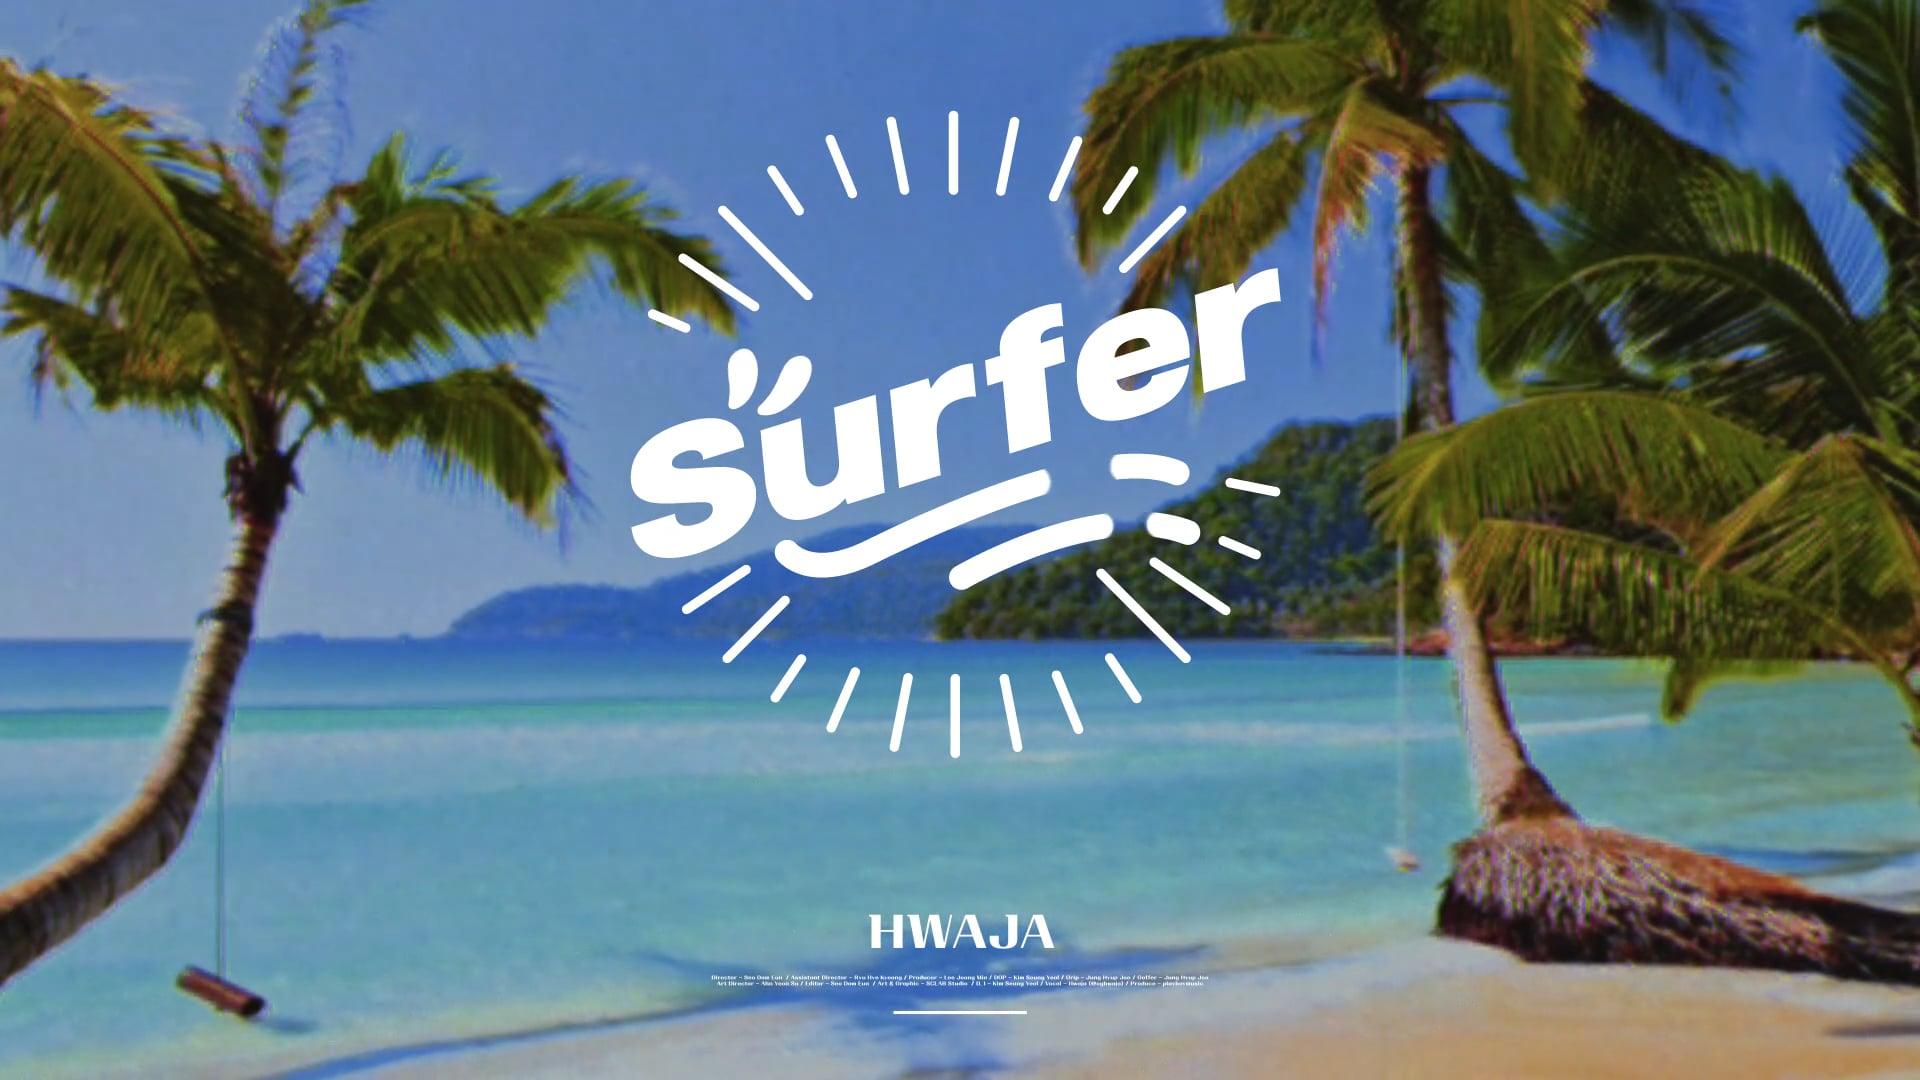 HWAJA 'Surfer'